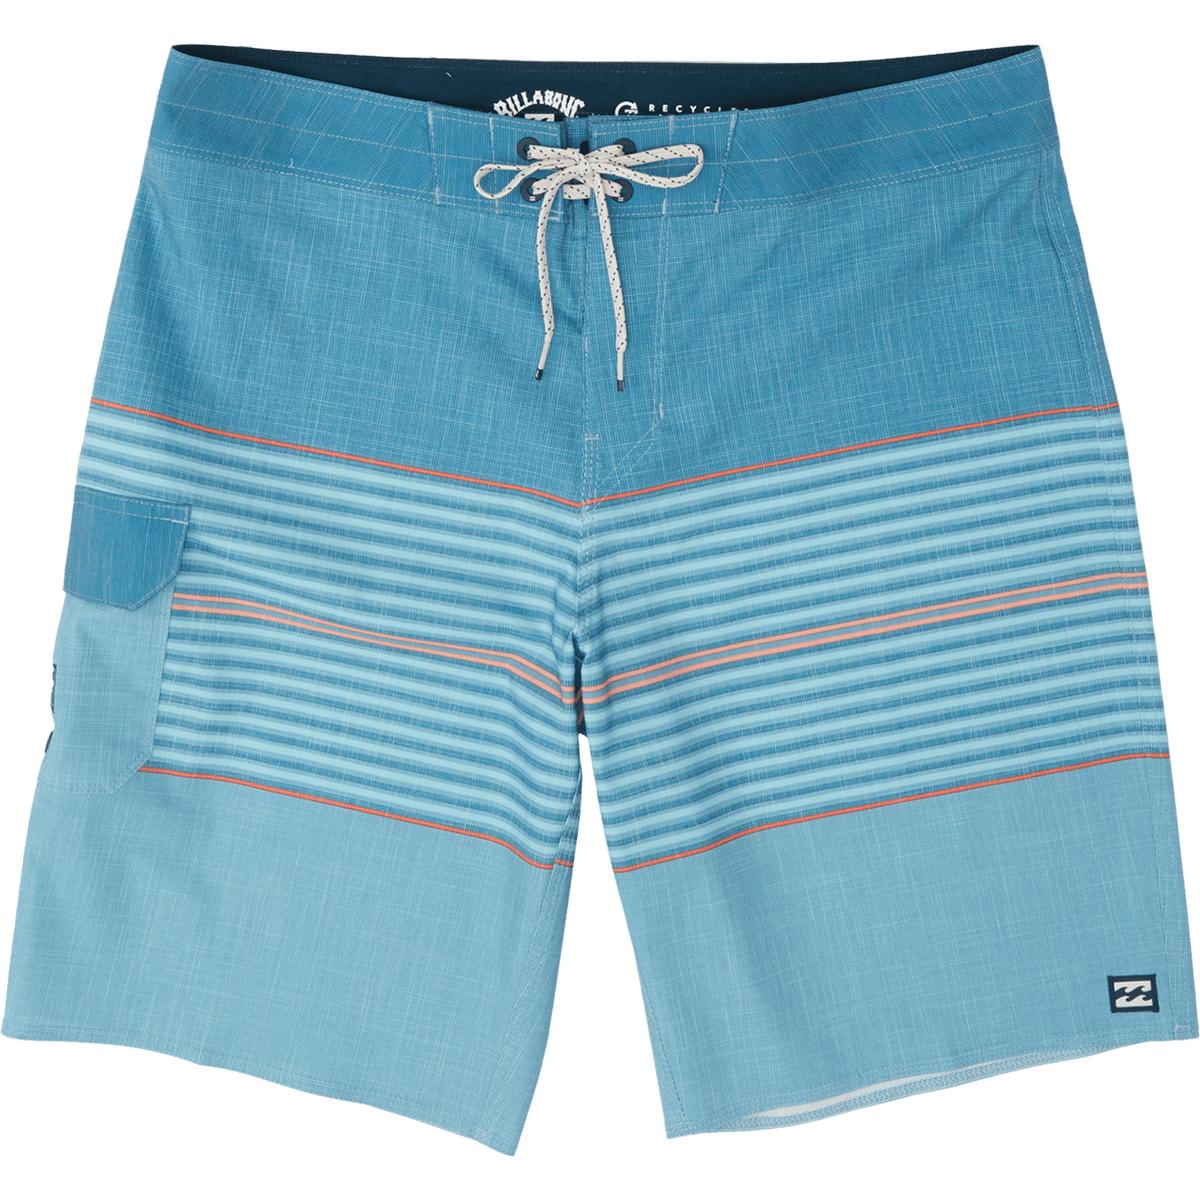 Billabong Men's All Day Pro Boardshorts - Blue, 36